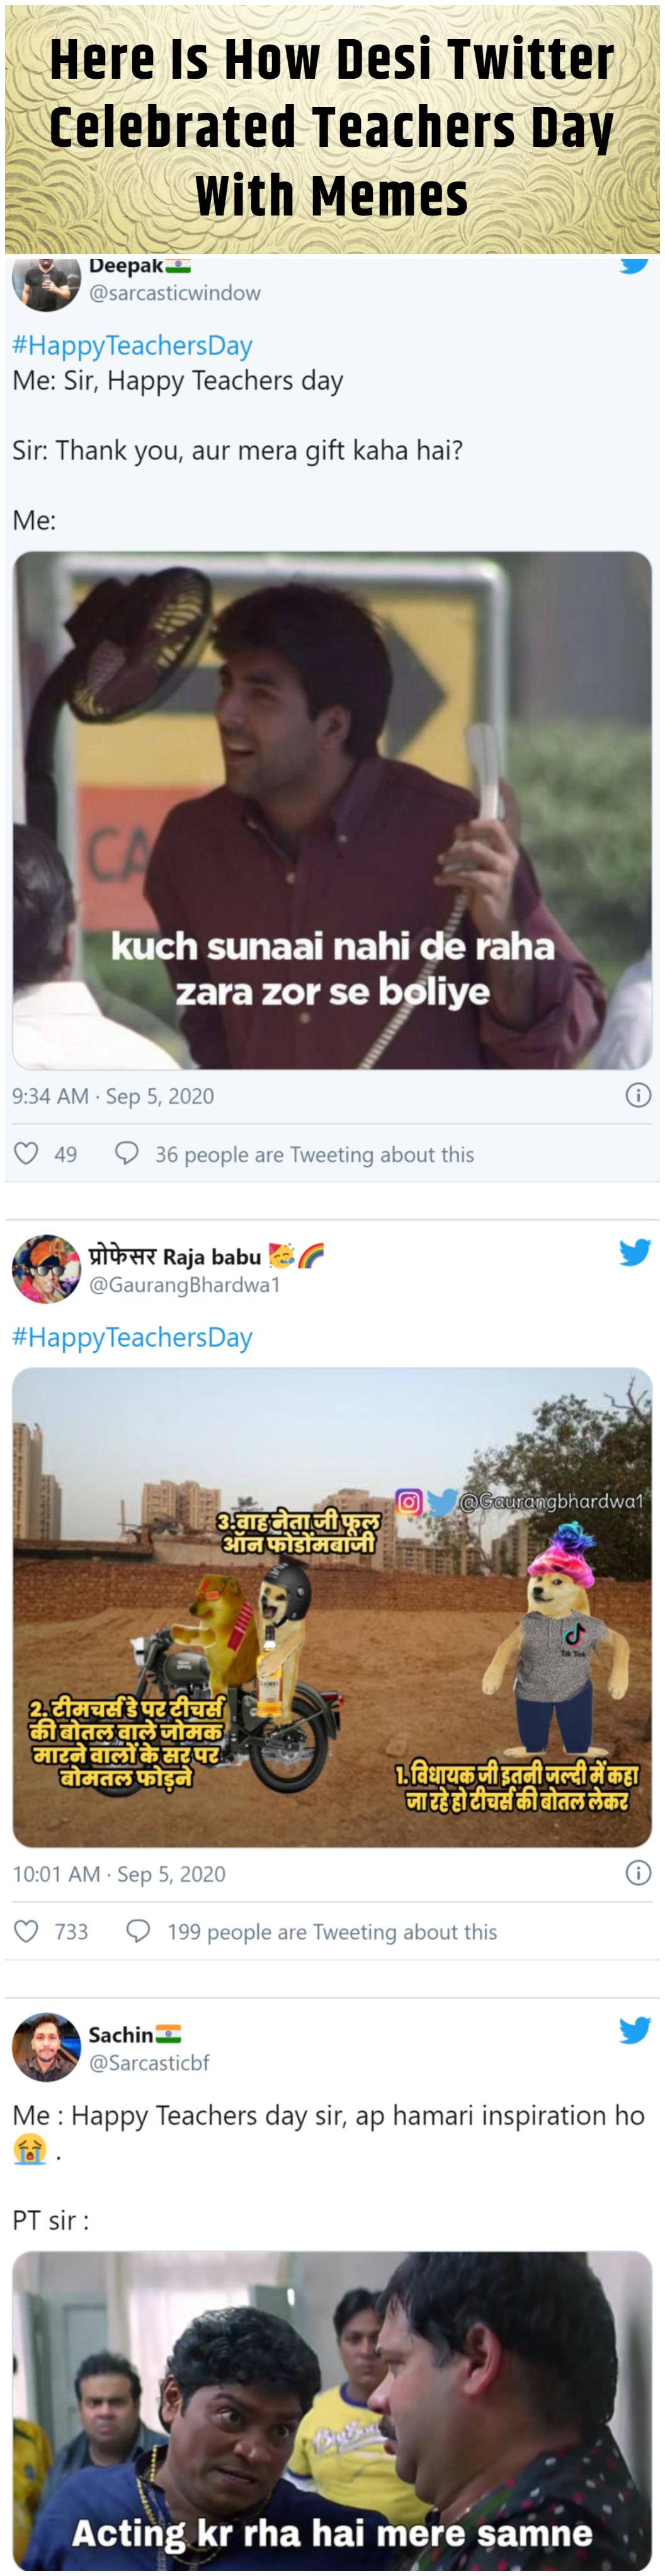 Here Is How Desi Twitter Celebrated Teachers Day With Memes Teachers Day Happy Teachers Day Celebrities